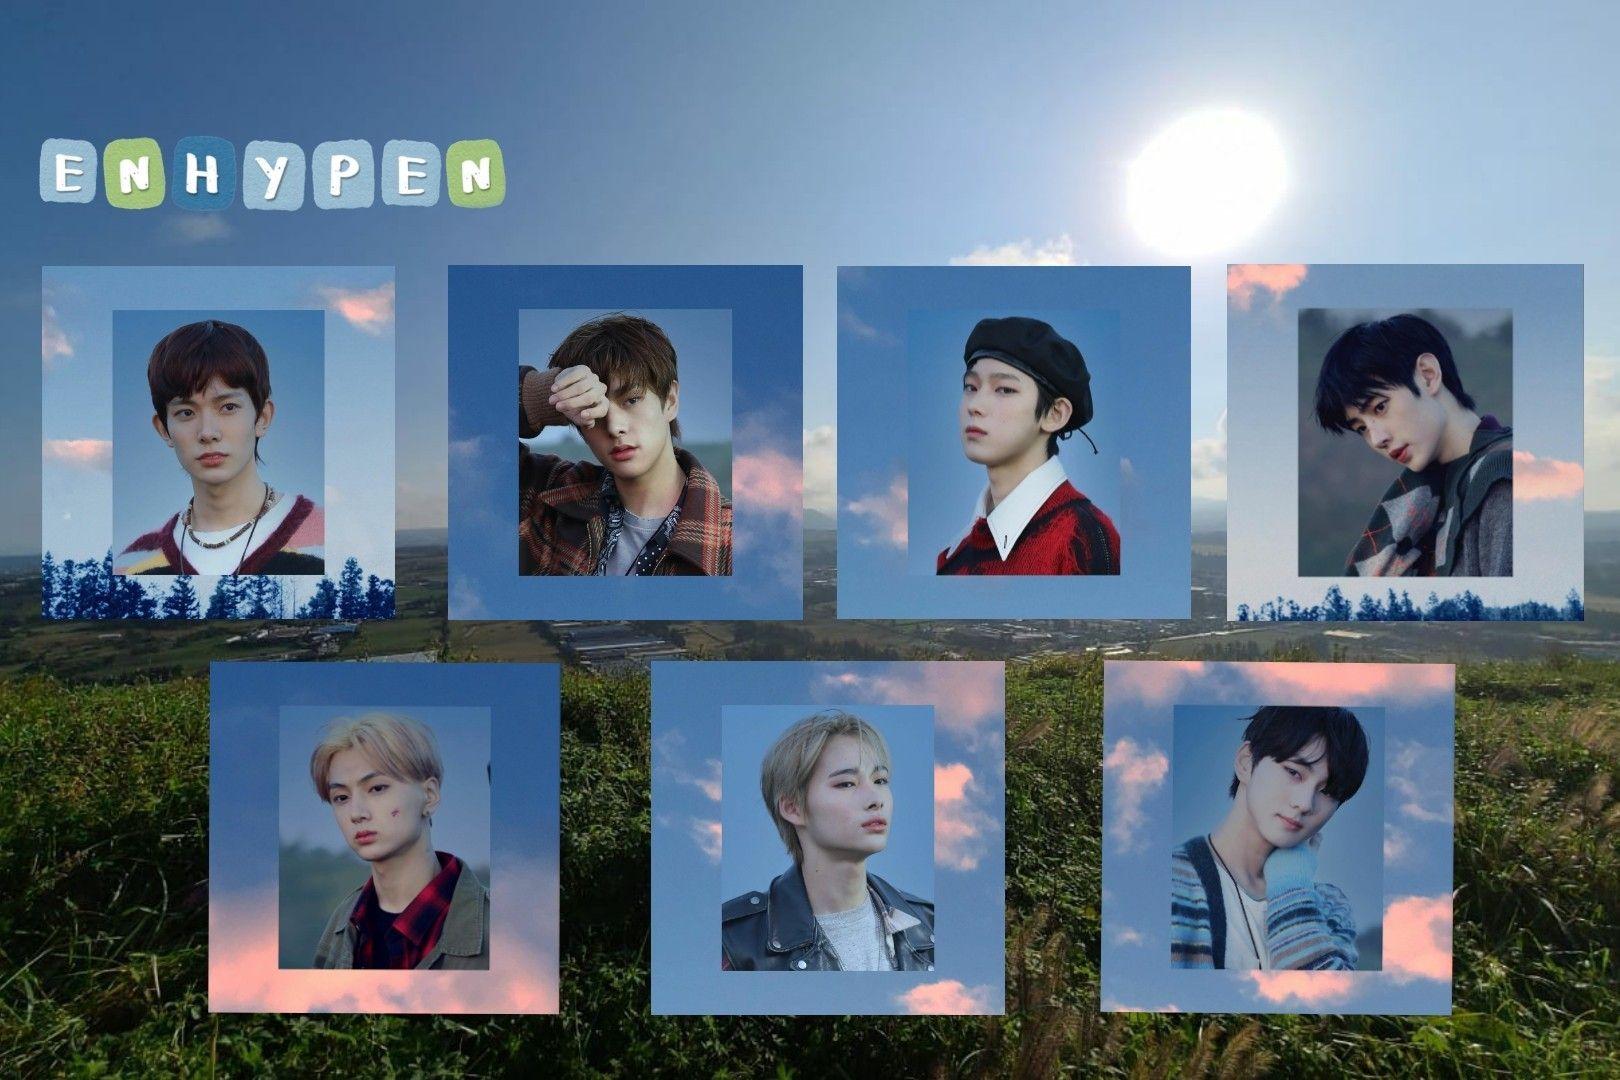 Enhypen Di 2021 Lagu Selebritas Enhypen wallpaper desktop hd